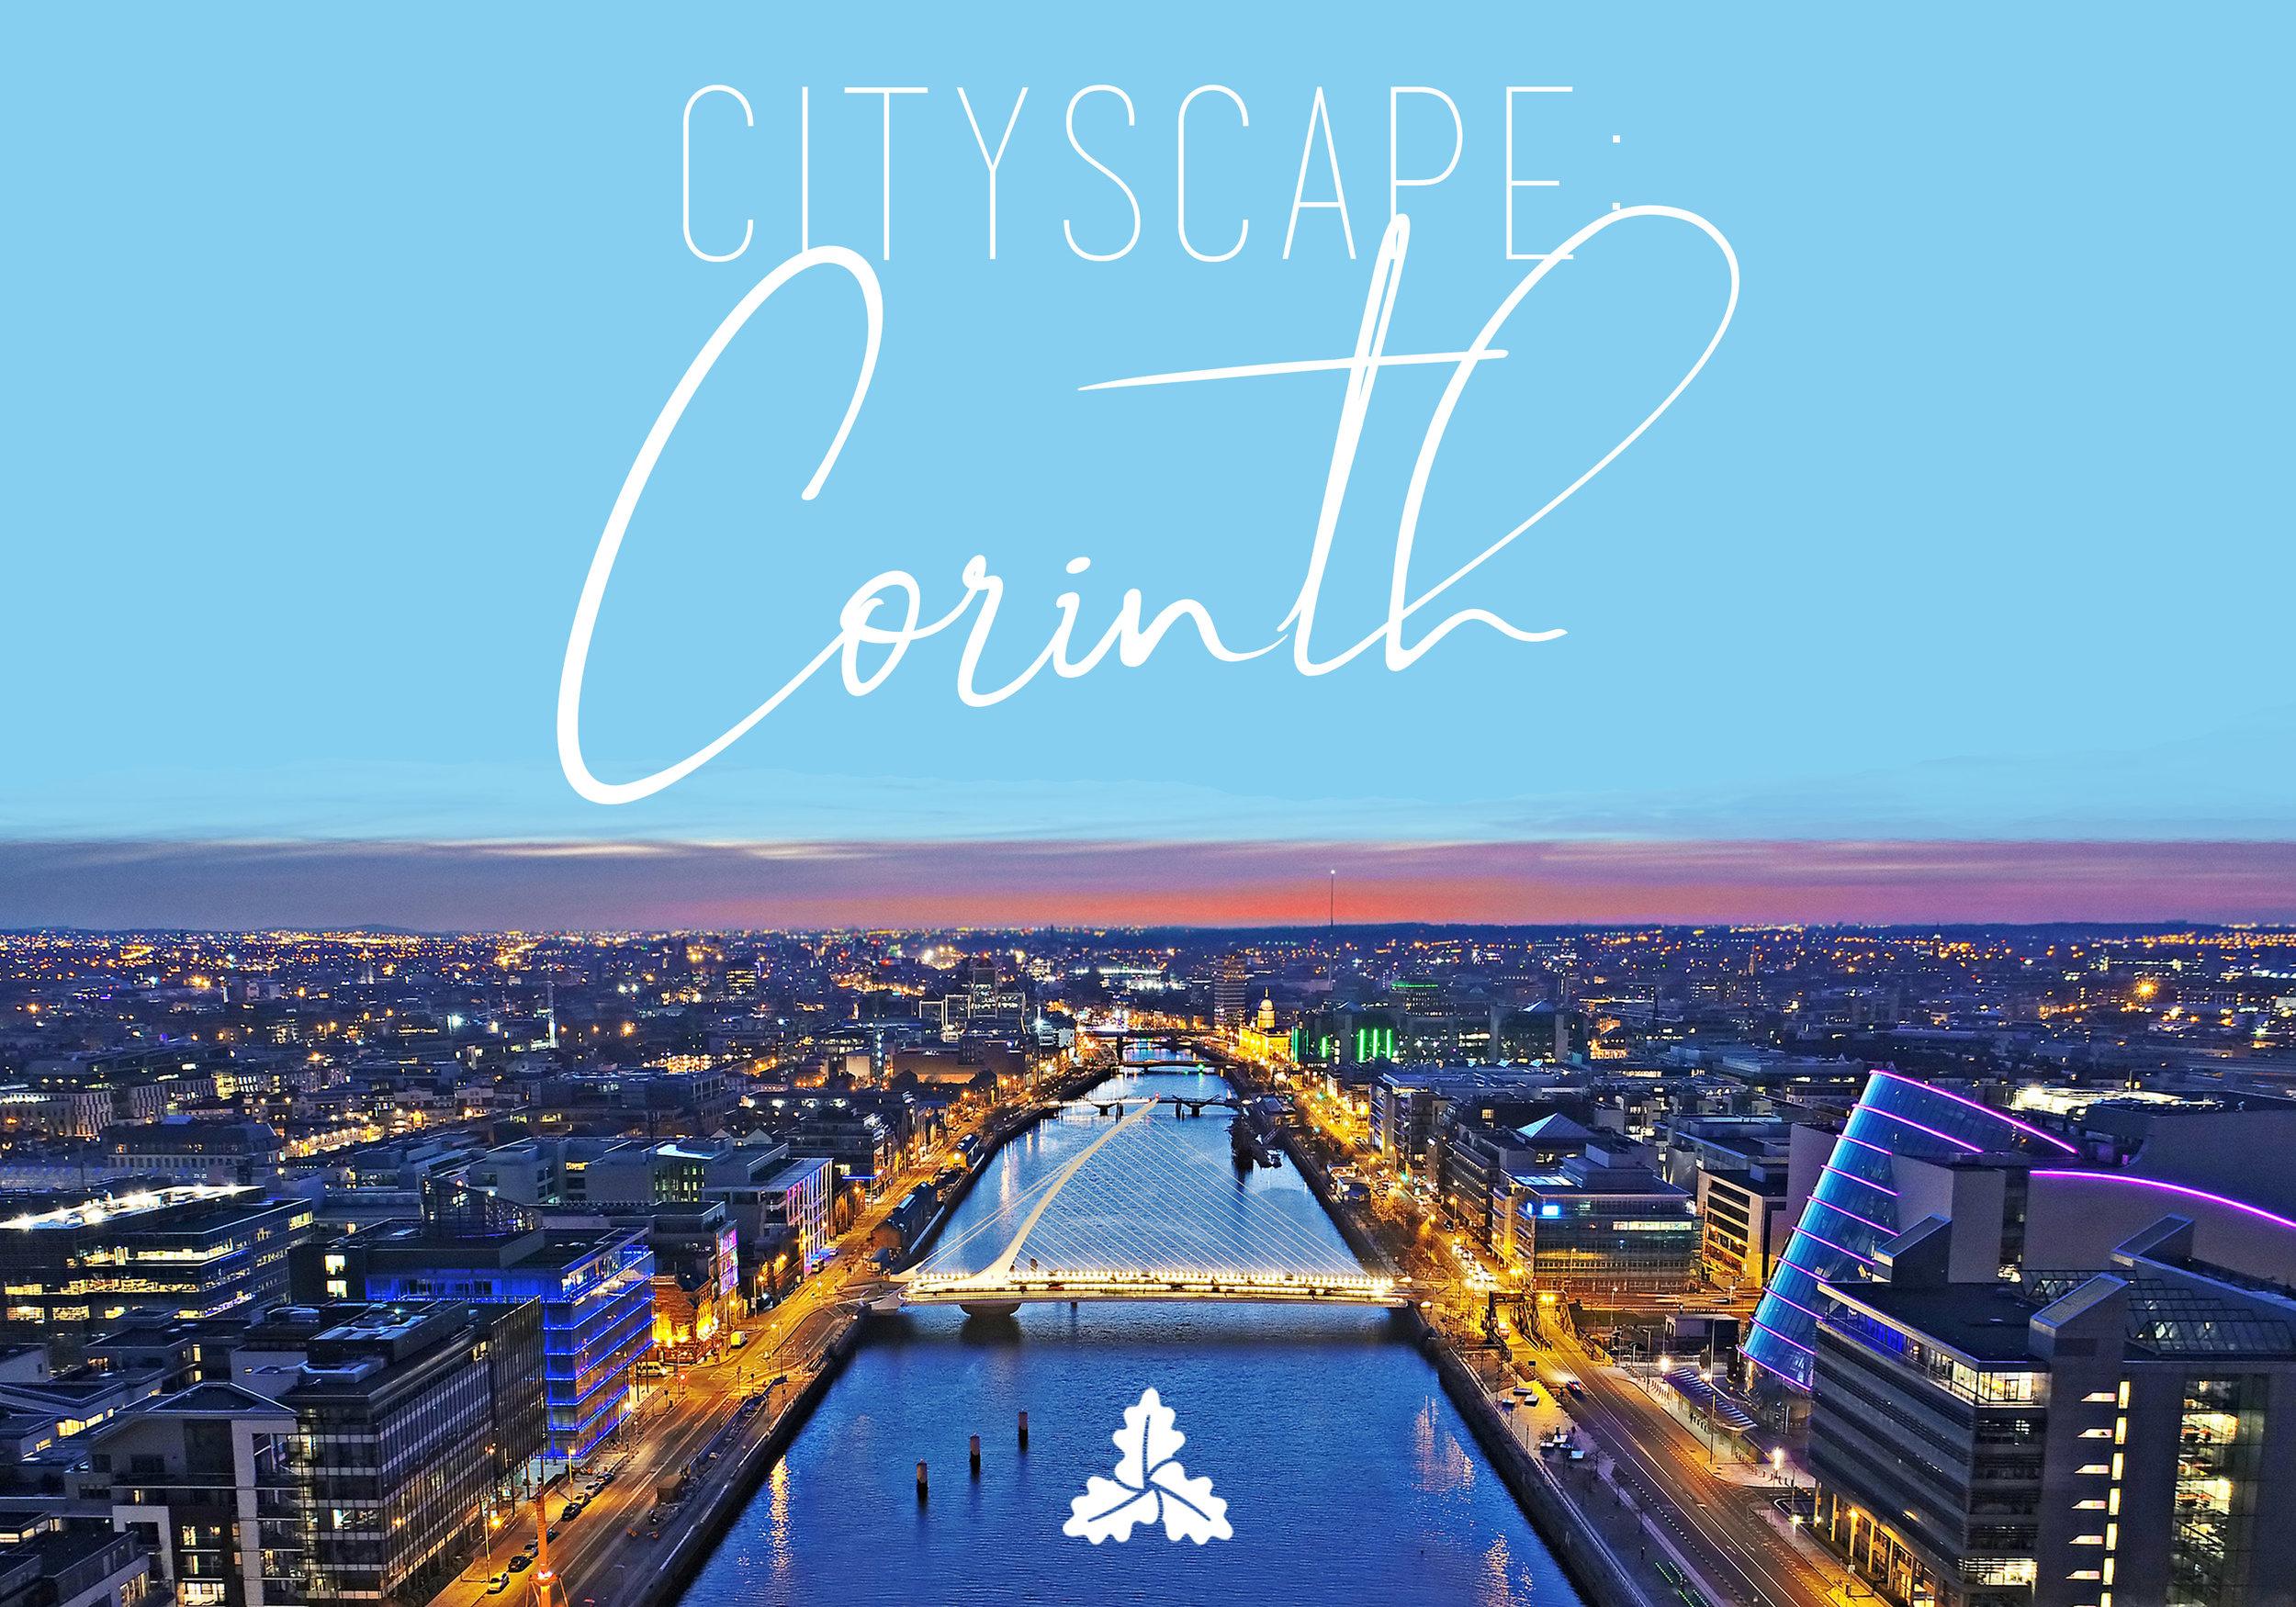 Cityscape Title.jpg